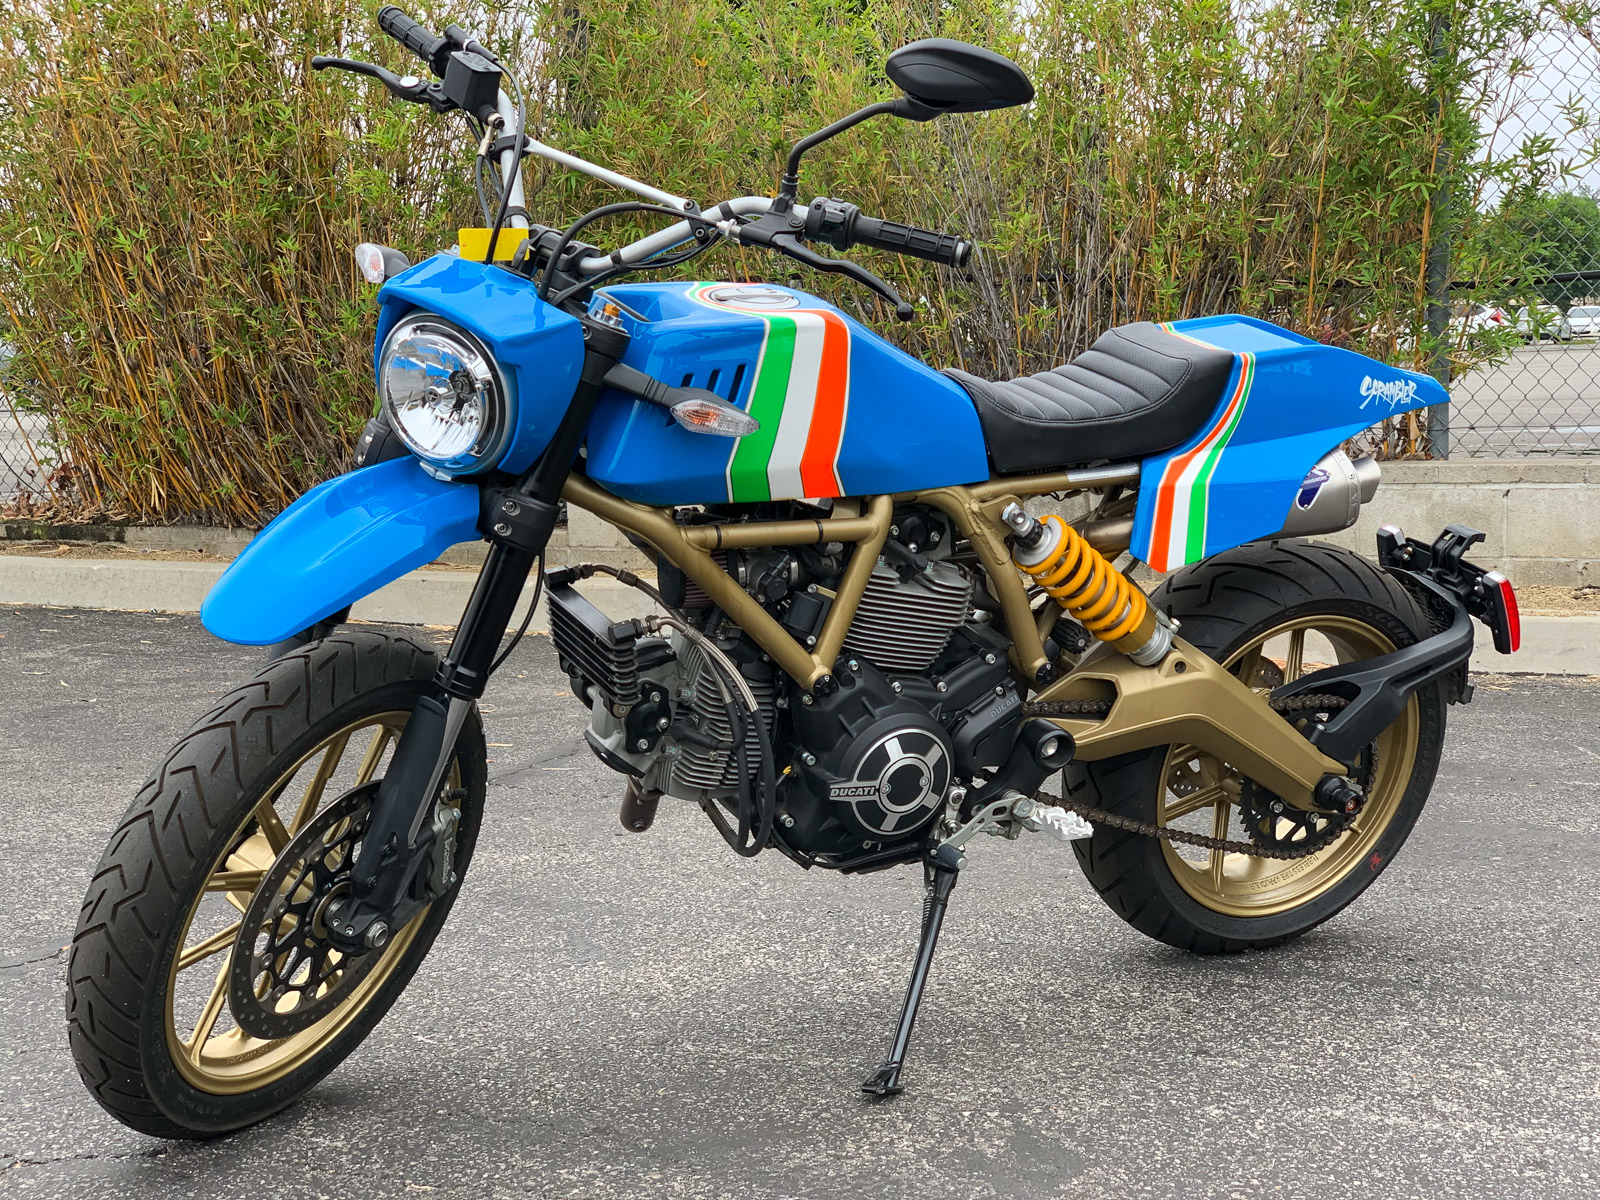 Bản custom Ducati Scrambler theo phong cách Dual-sport thập niên 80